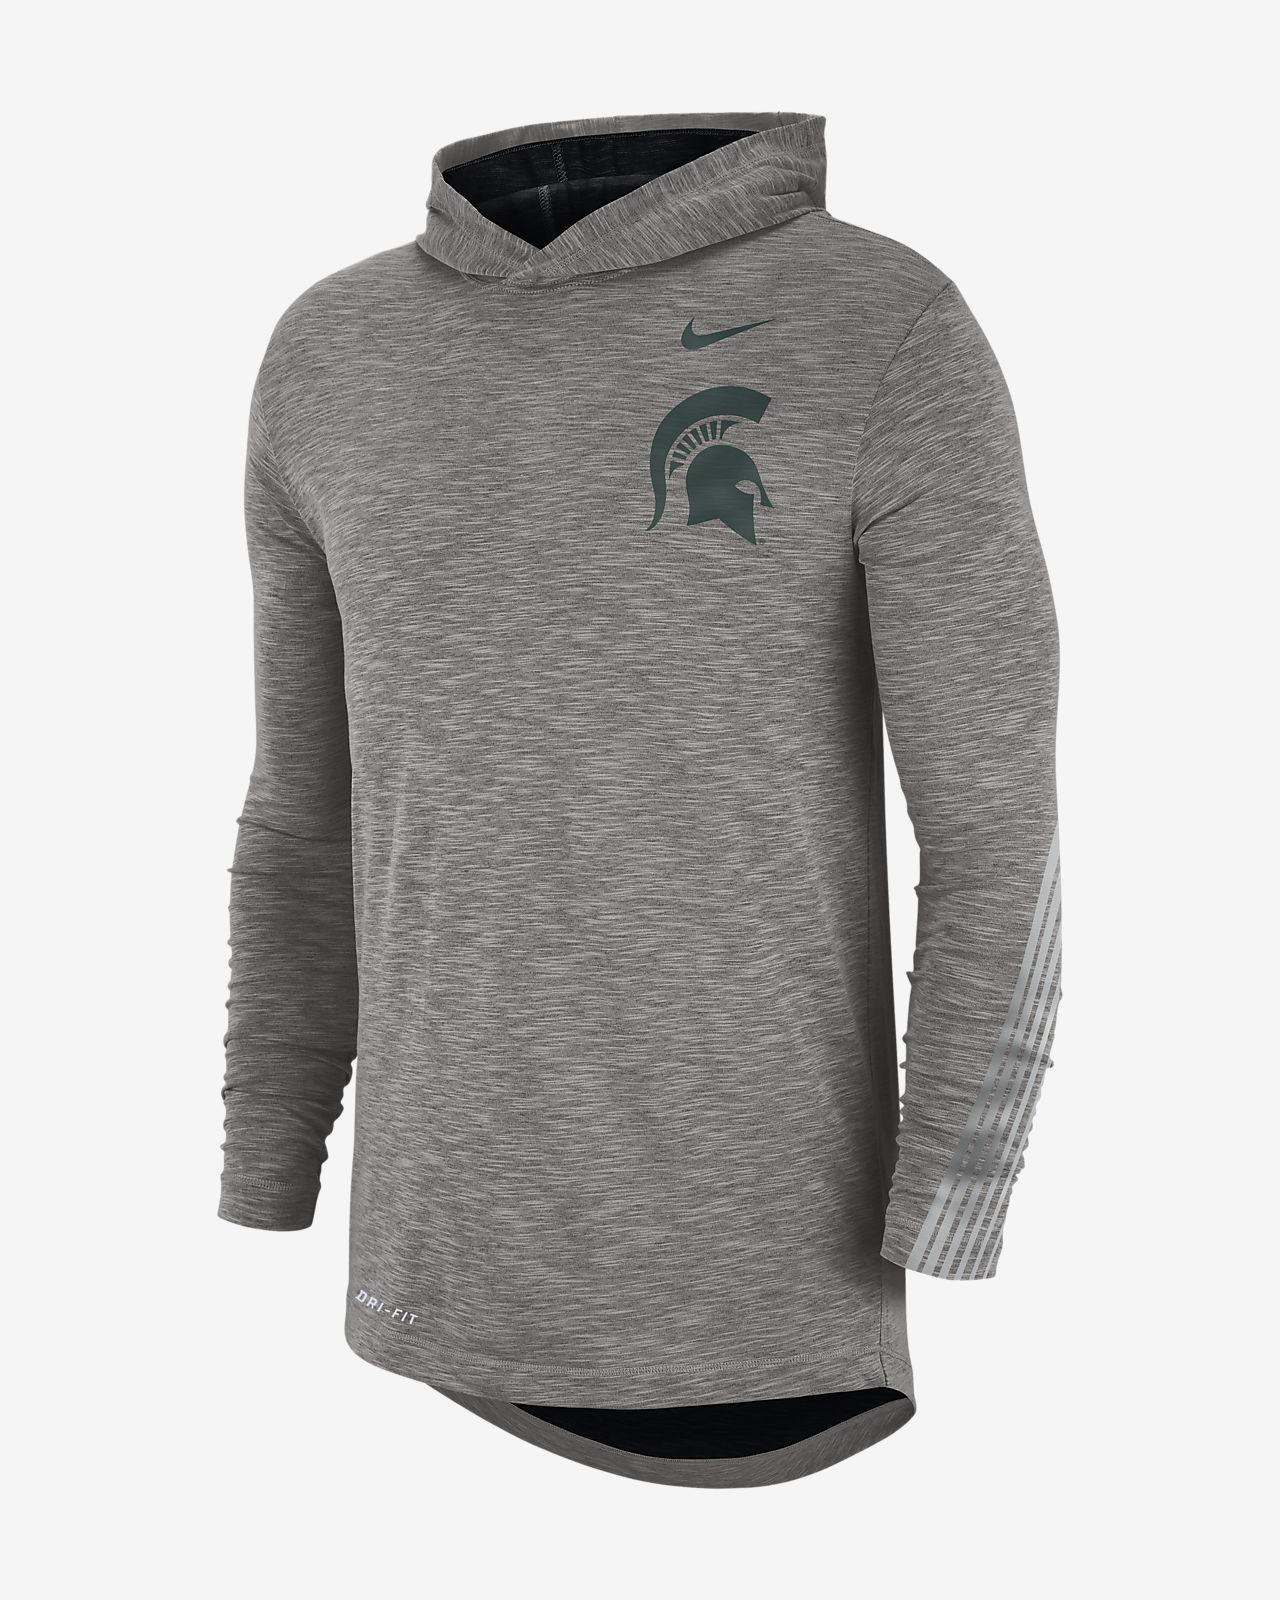 Nike College (Michigan State) Men's Long-Sleeve Hooded T-Shirt